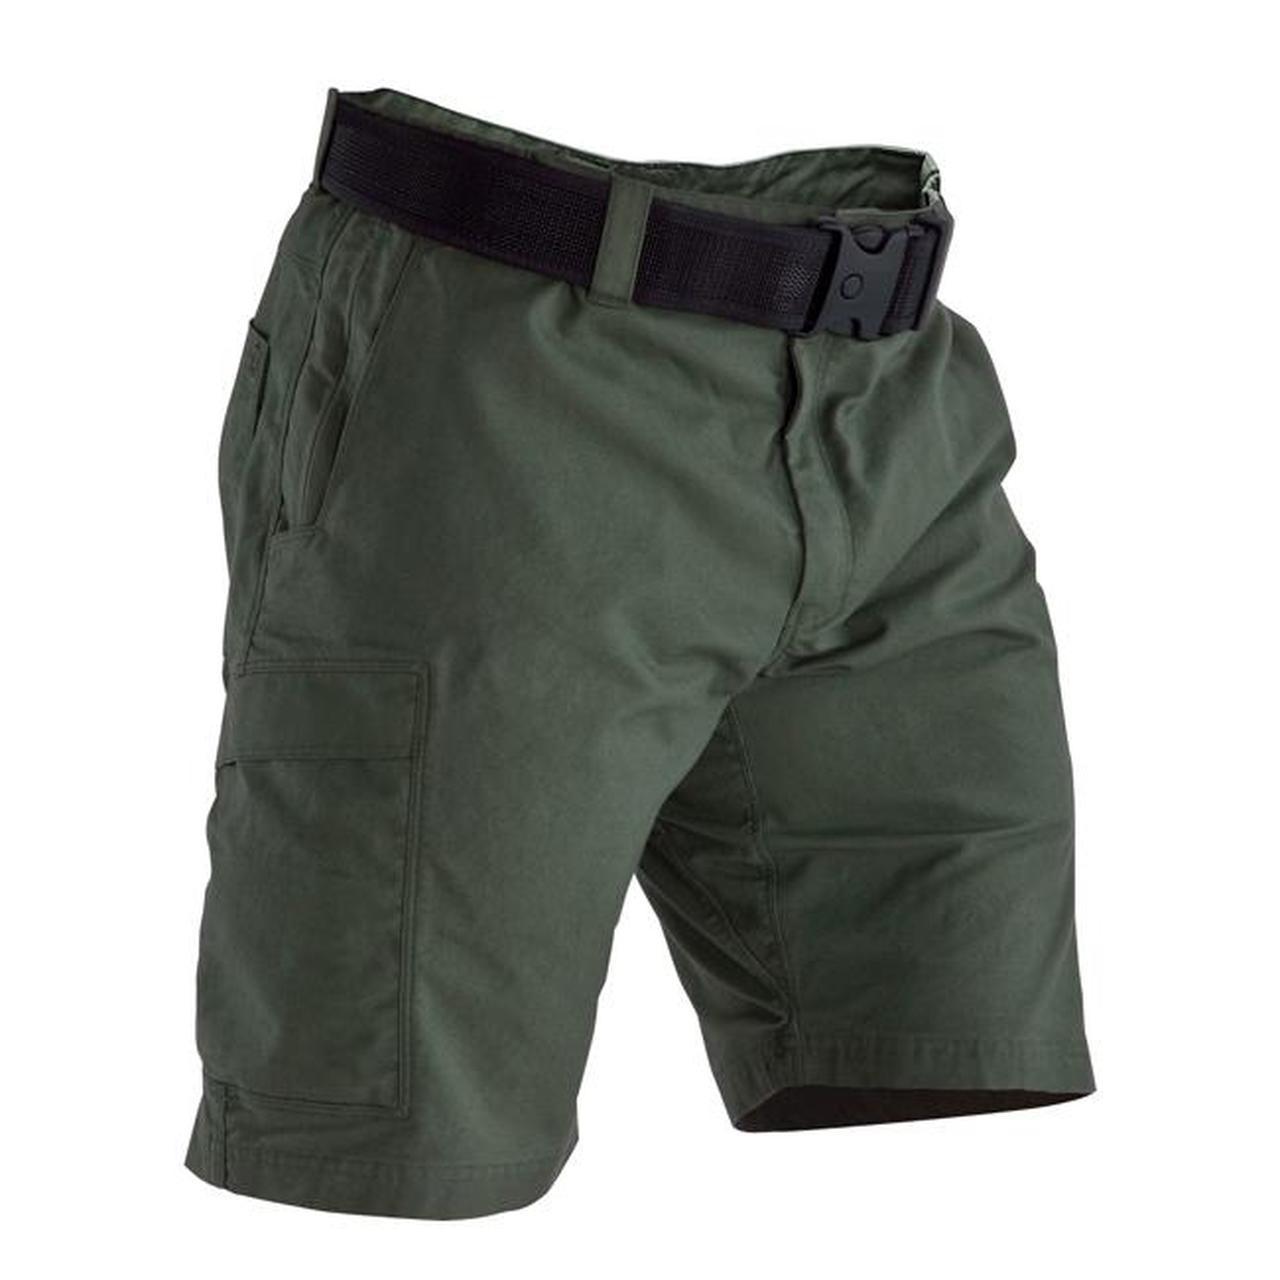 Vertx Vertx Legacy Phantom LT Shorts